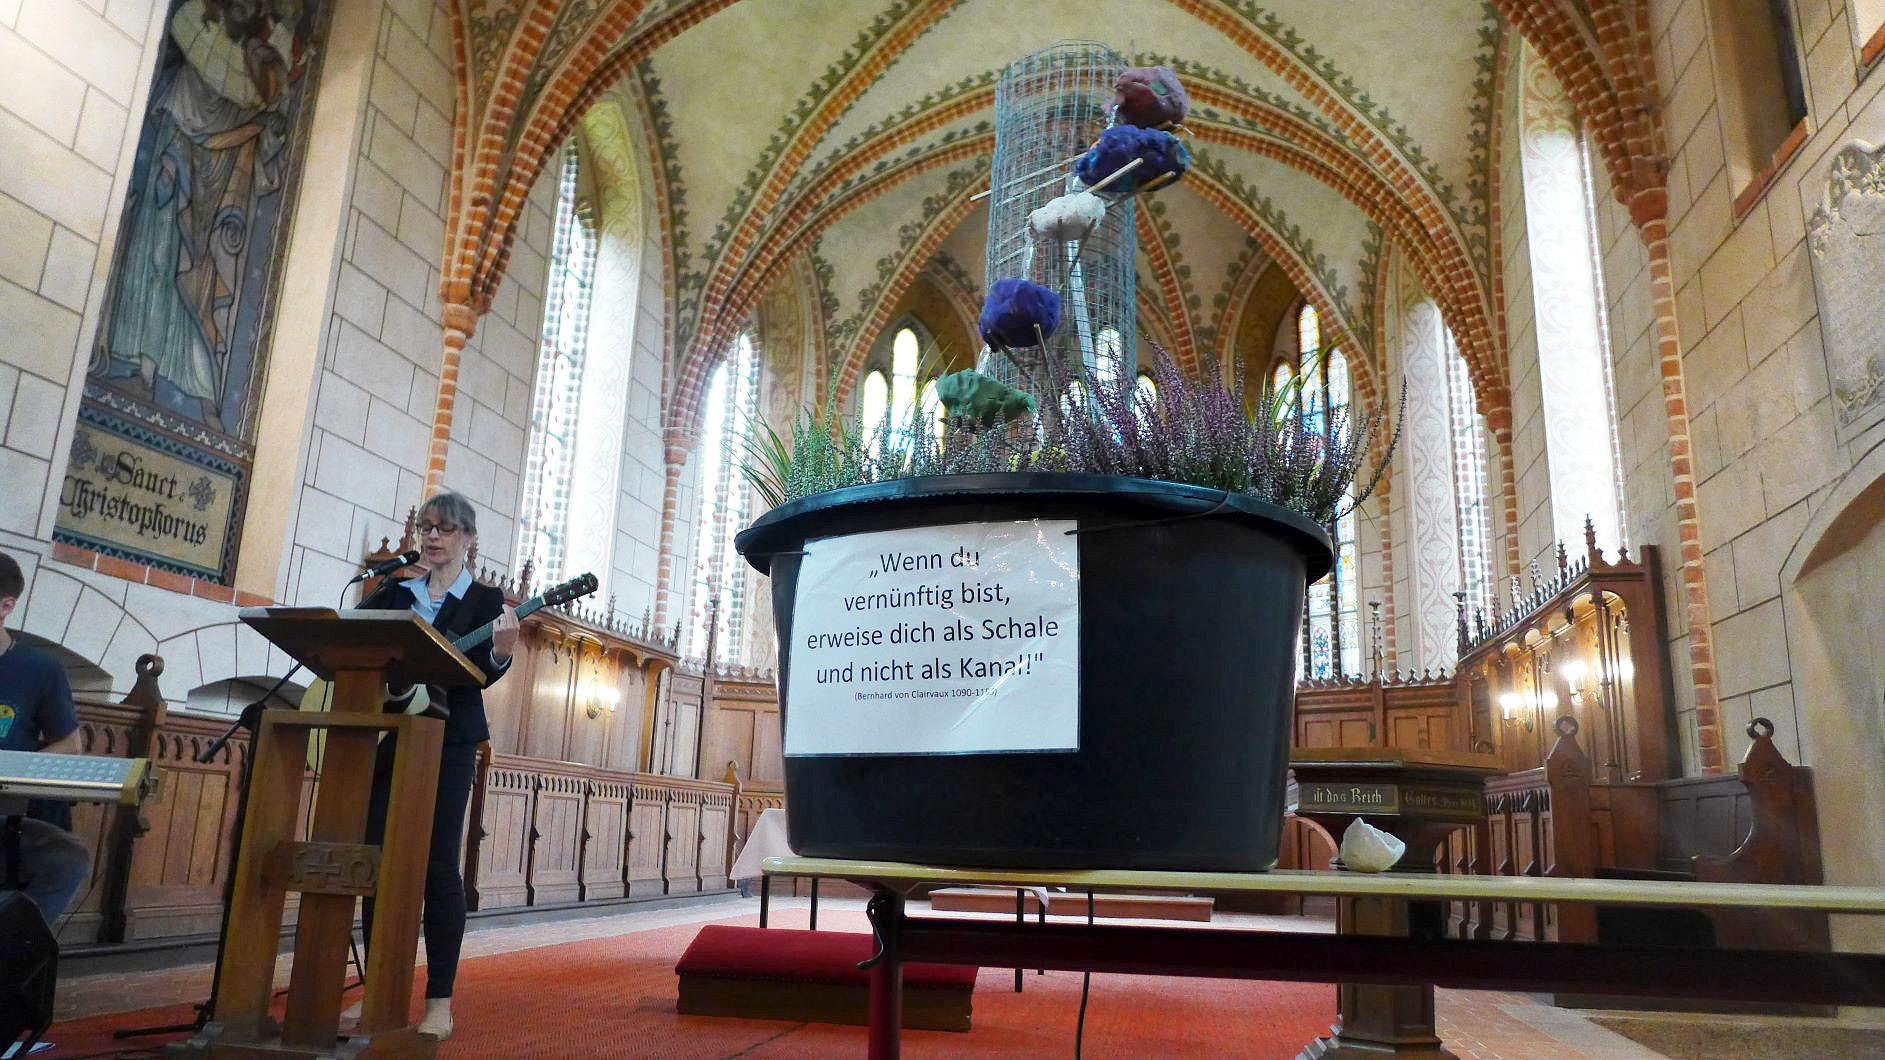 Brunnen der Gemeinschaft in der Kirche Marienfliess - Zukunftswerkstatt Quellort Kloster Marienfliess